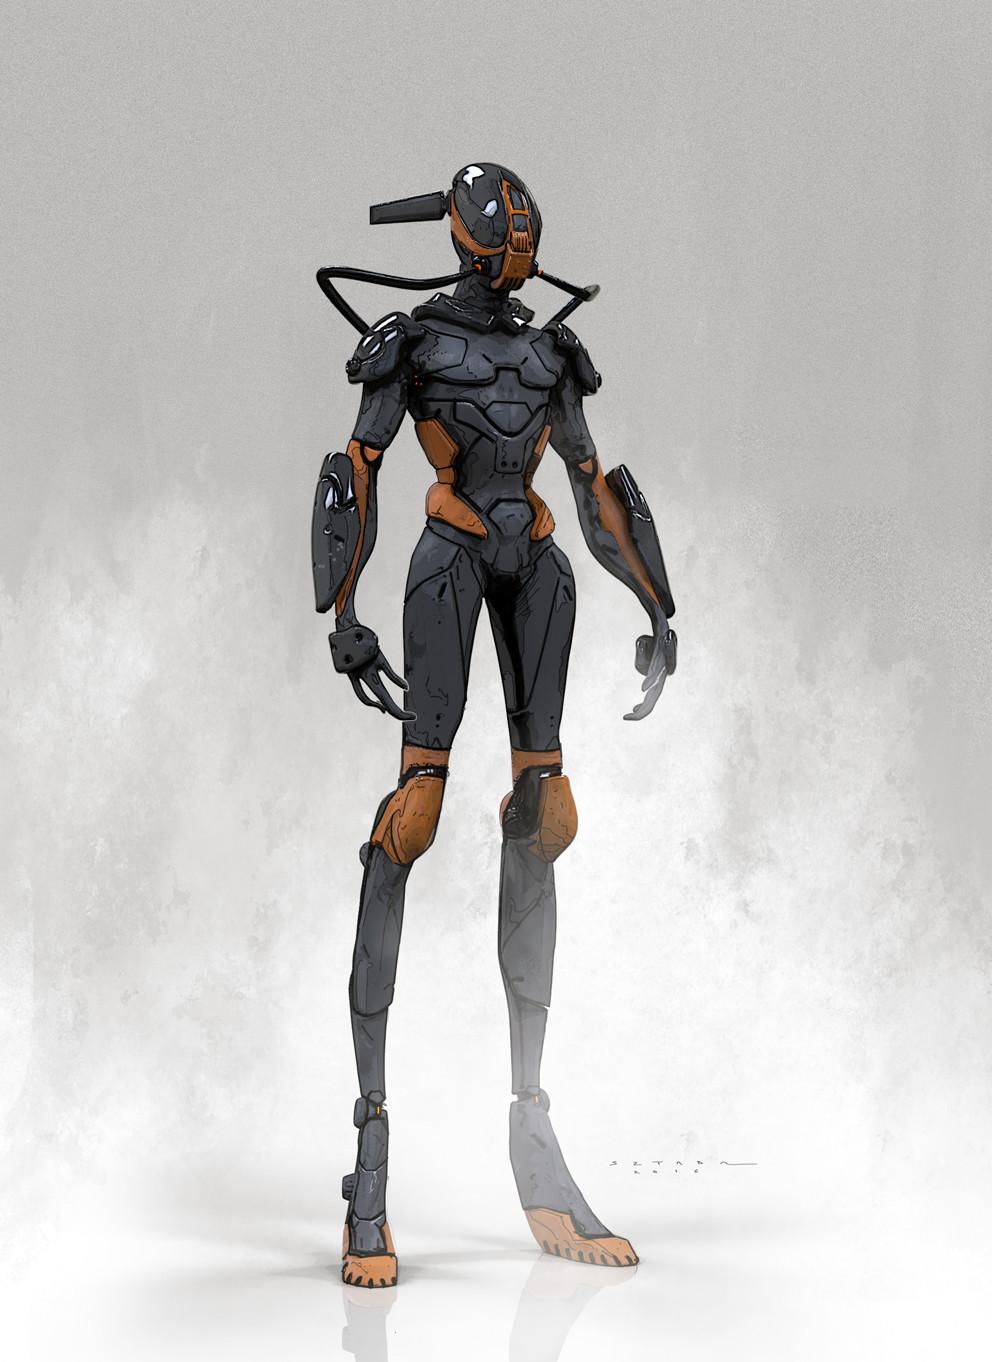 Mack sztaba humanoid